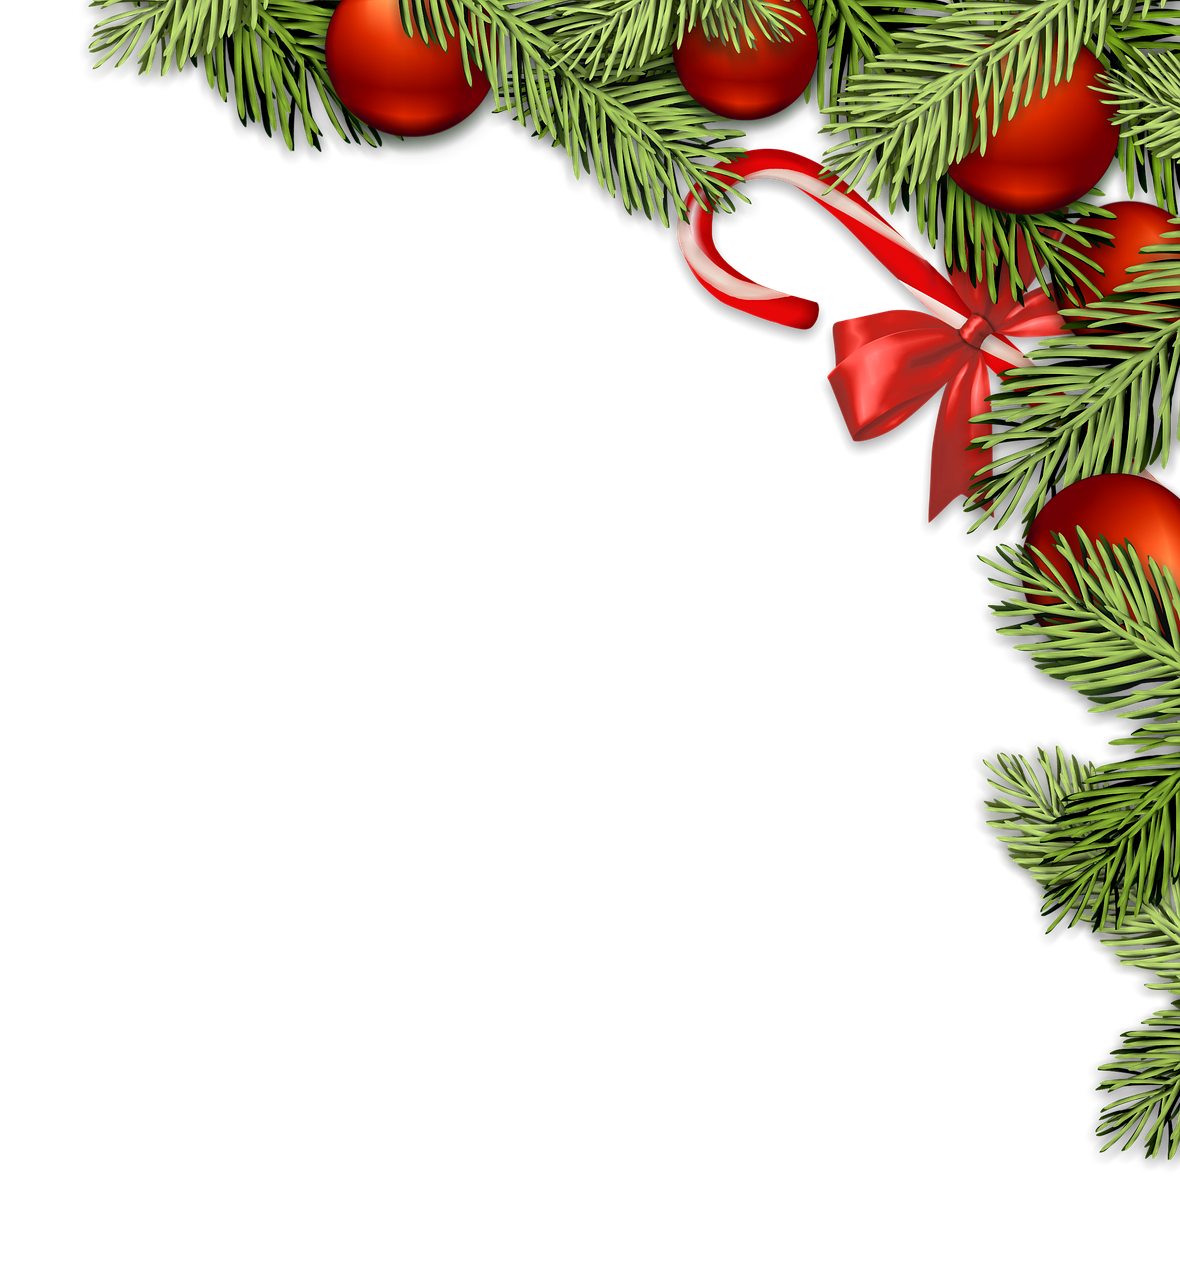 Christmas Decorations Transparent Image